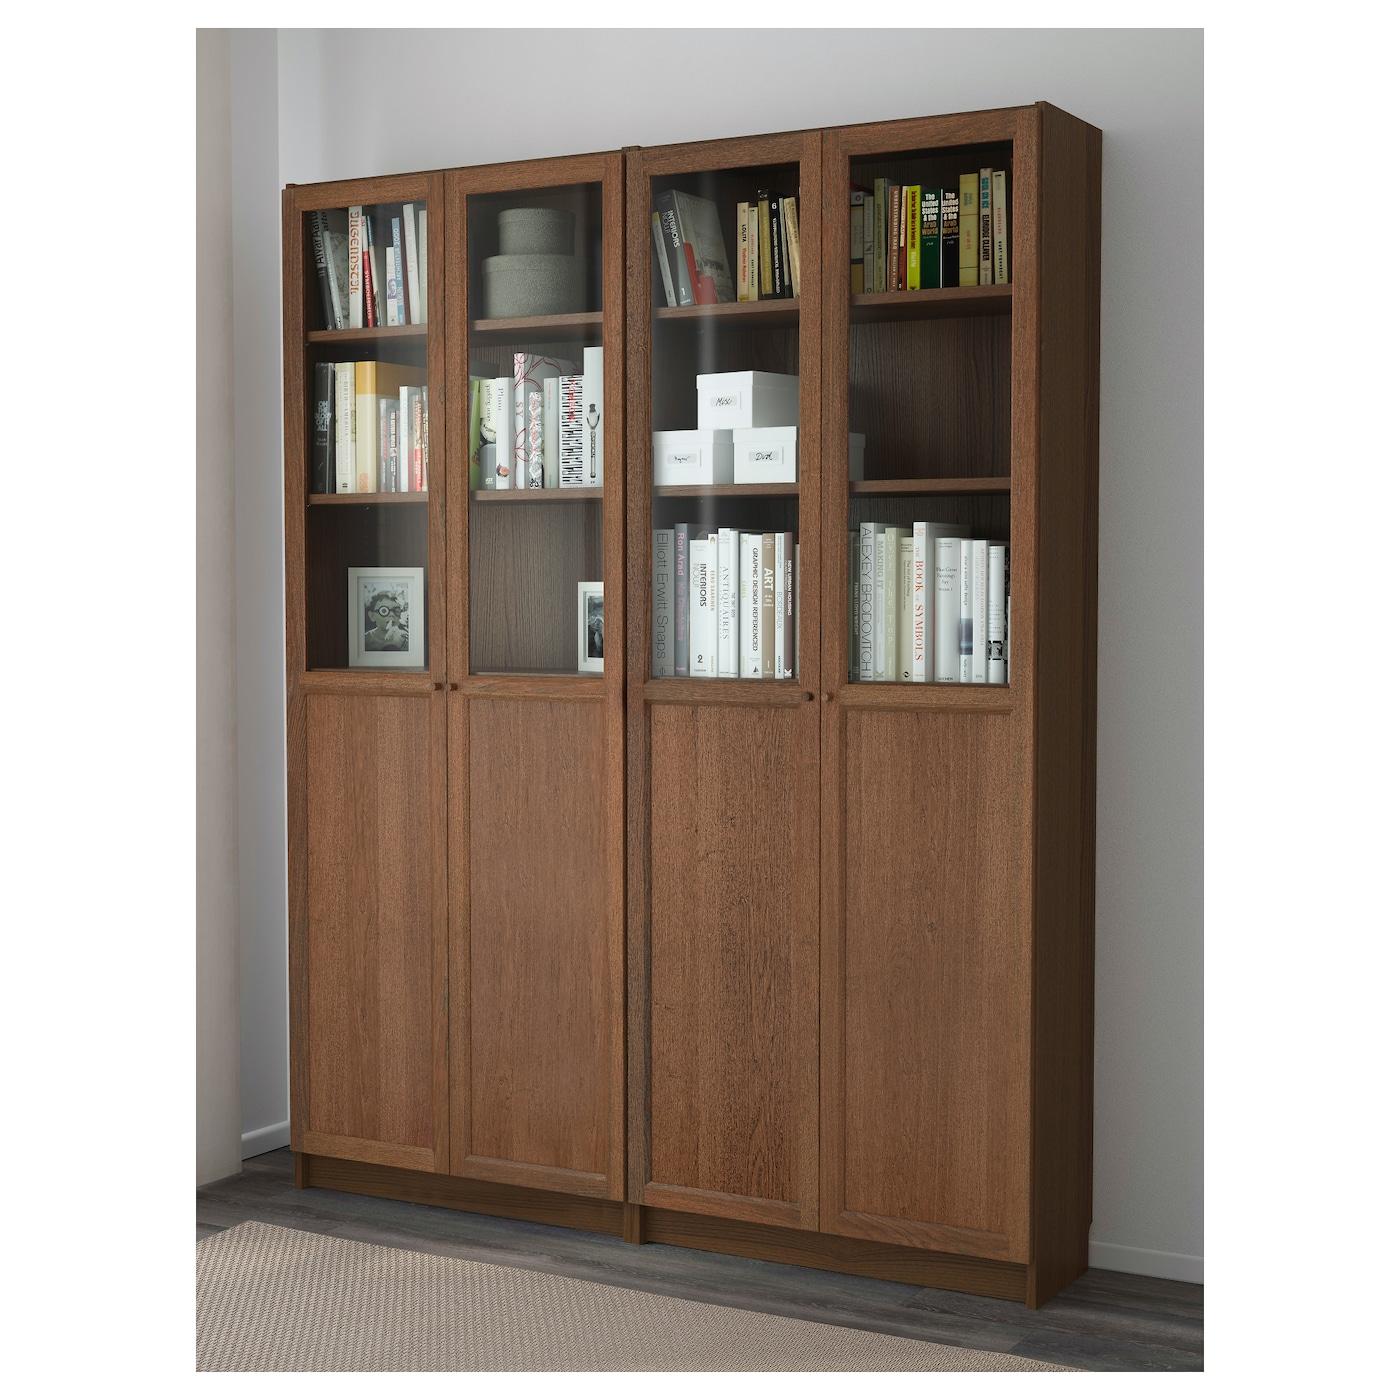 Billy oxberg bookcase brown ash veneer 160x202x30 cm ikea - Ikea billy porte vitree ...